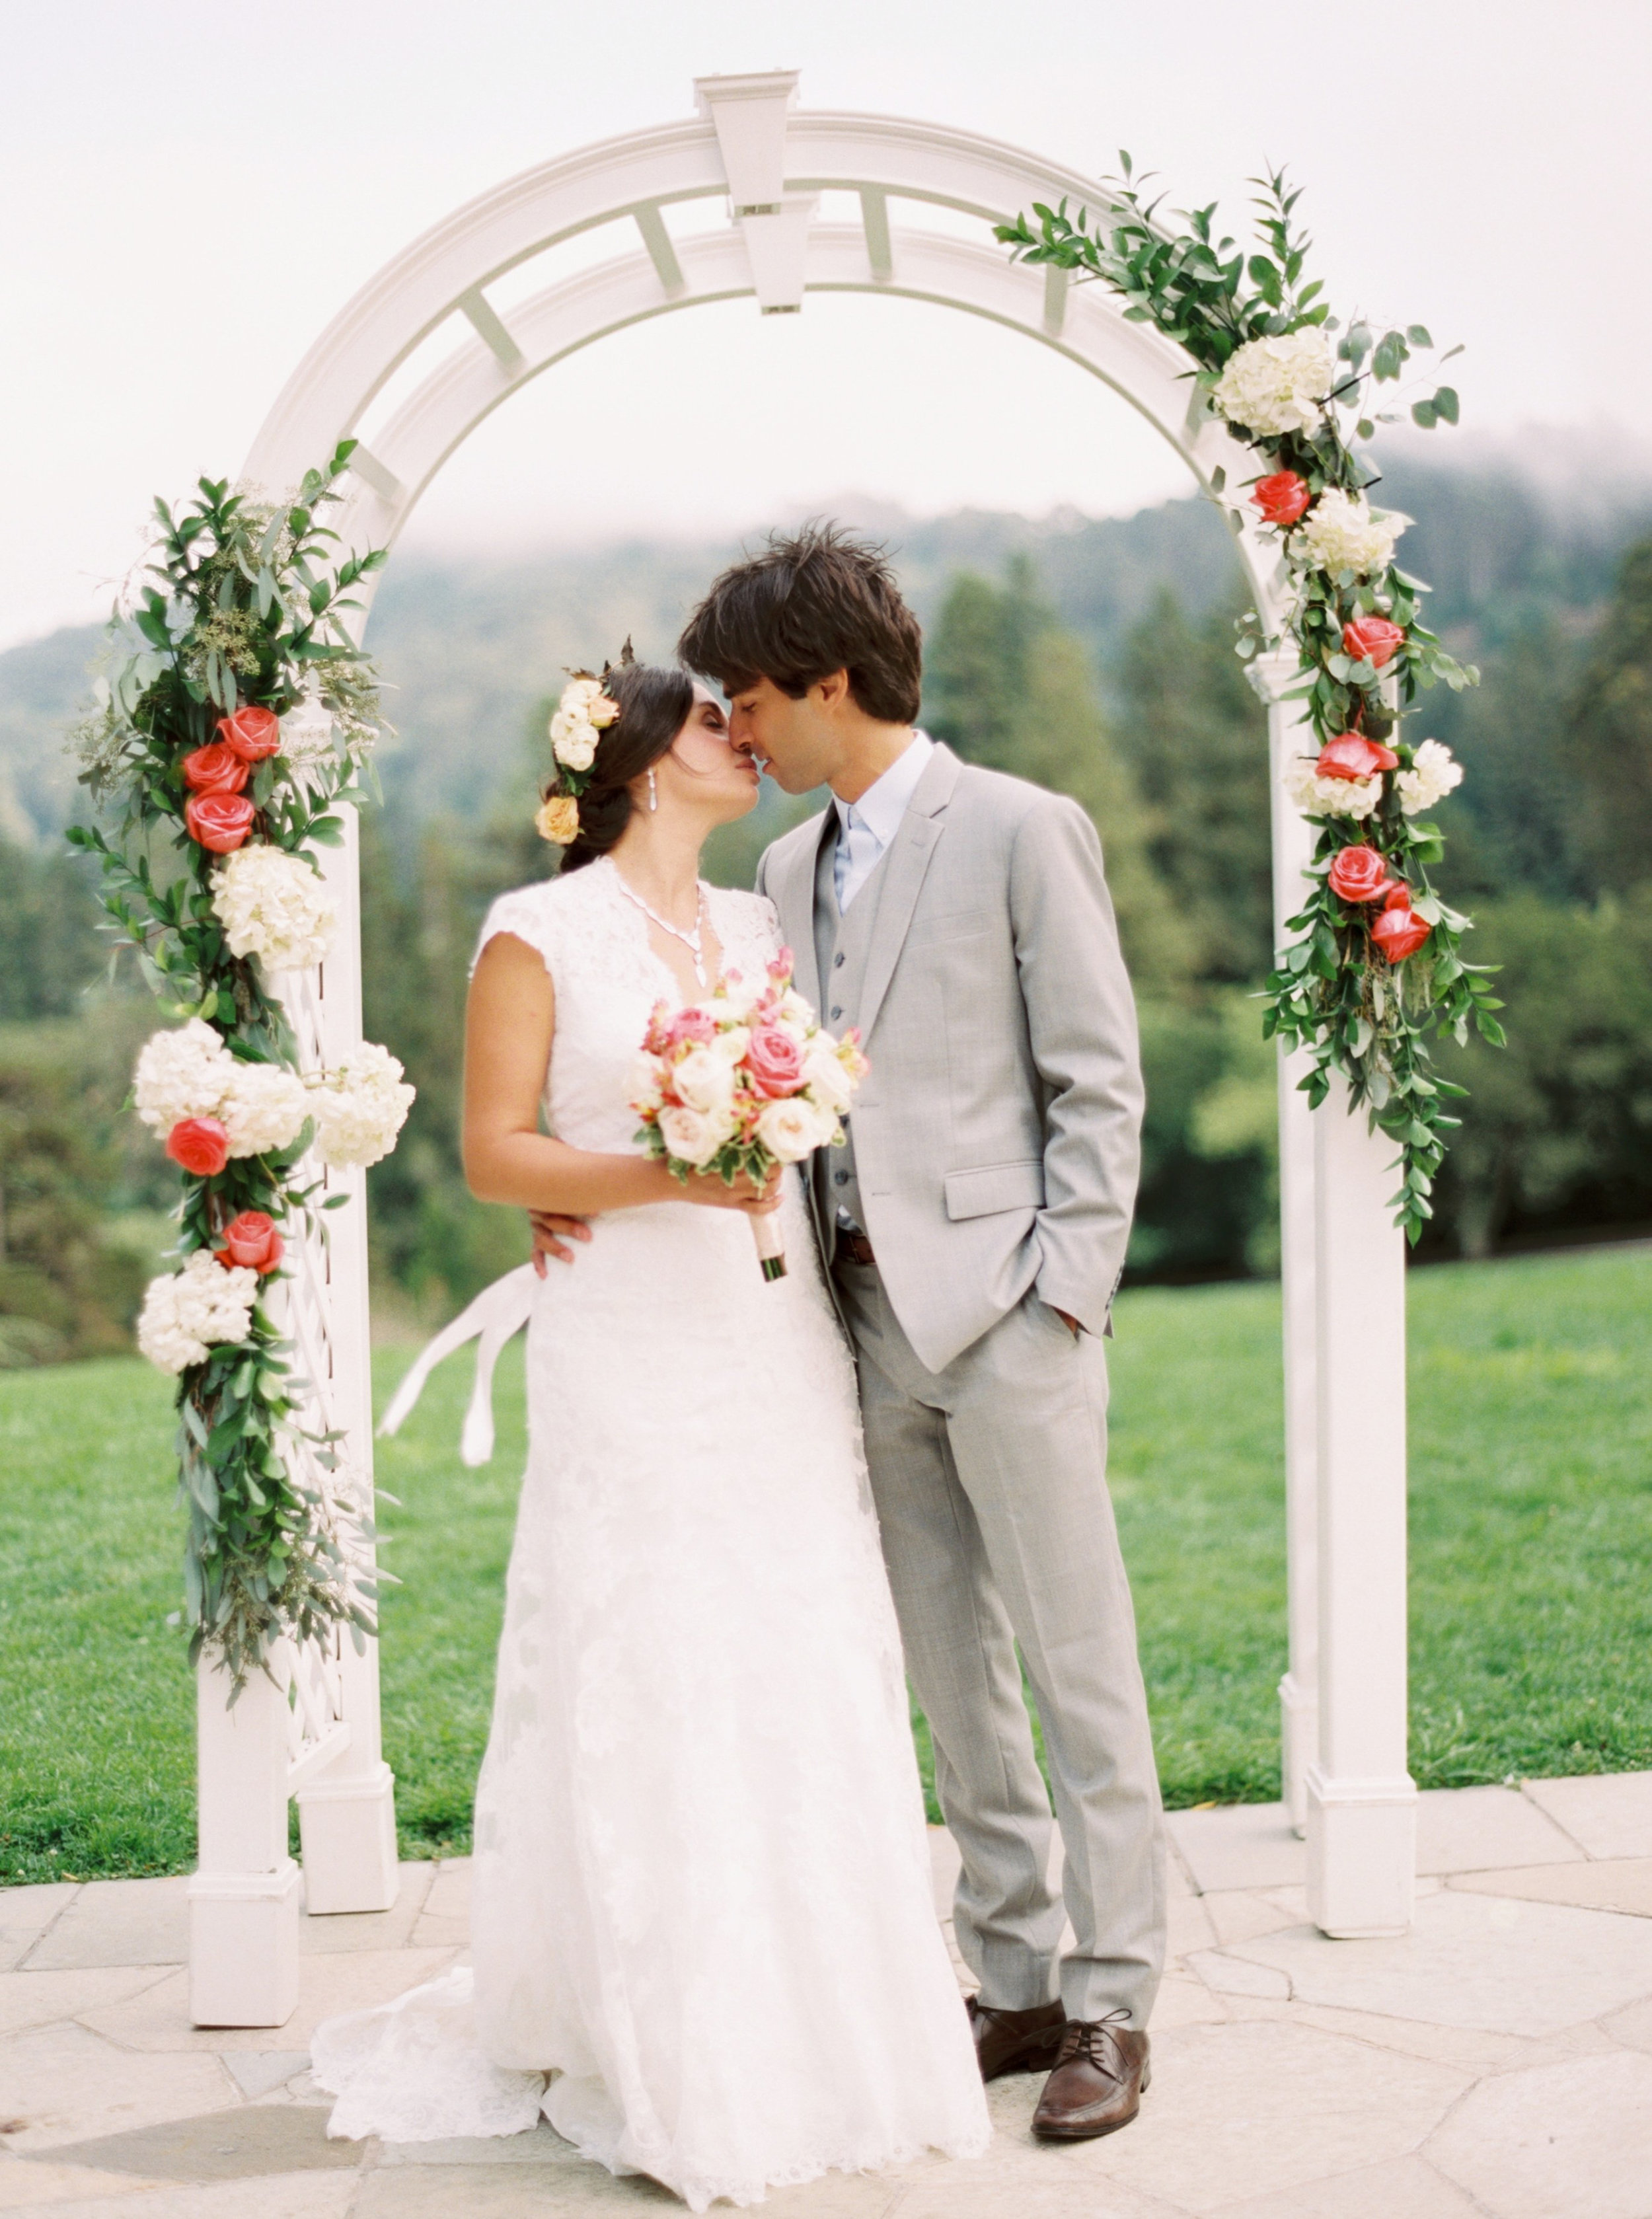 Blerina-and-Alain-wedding-283.jpg